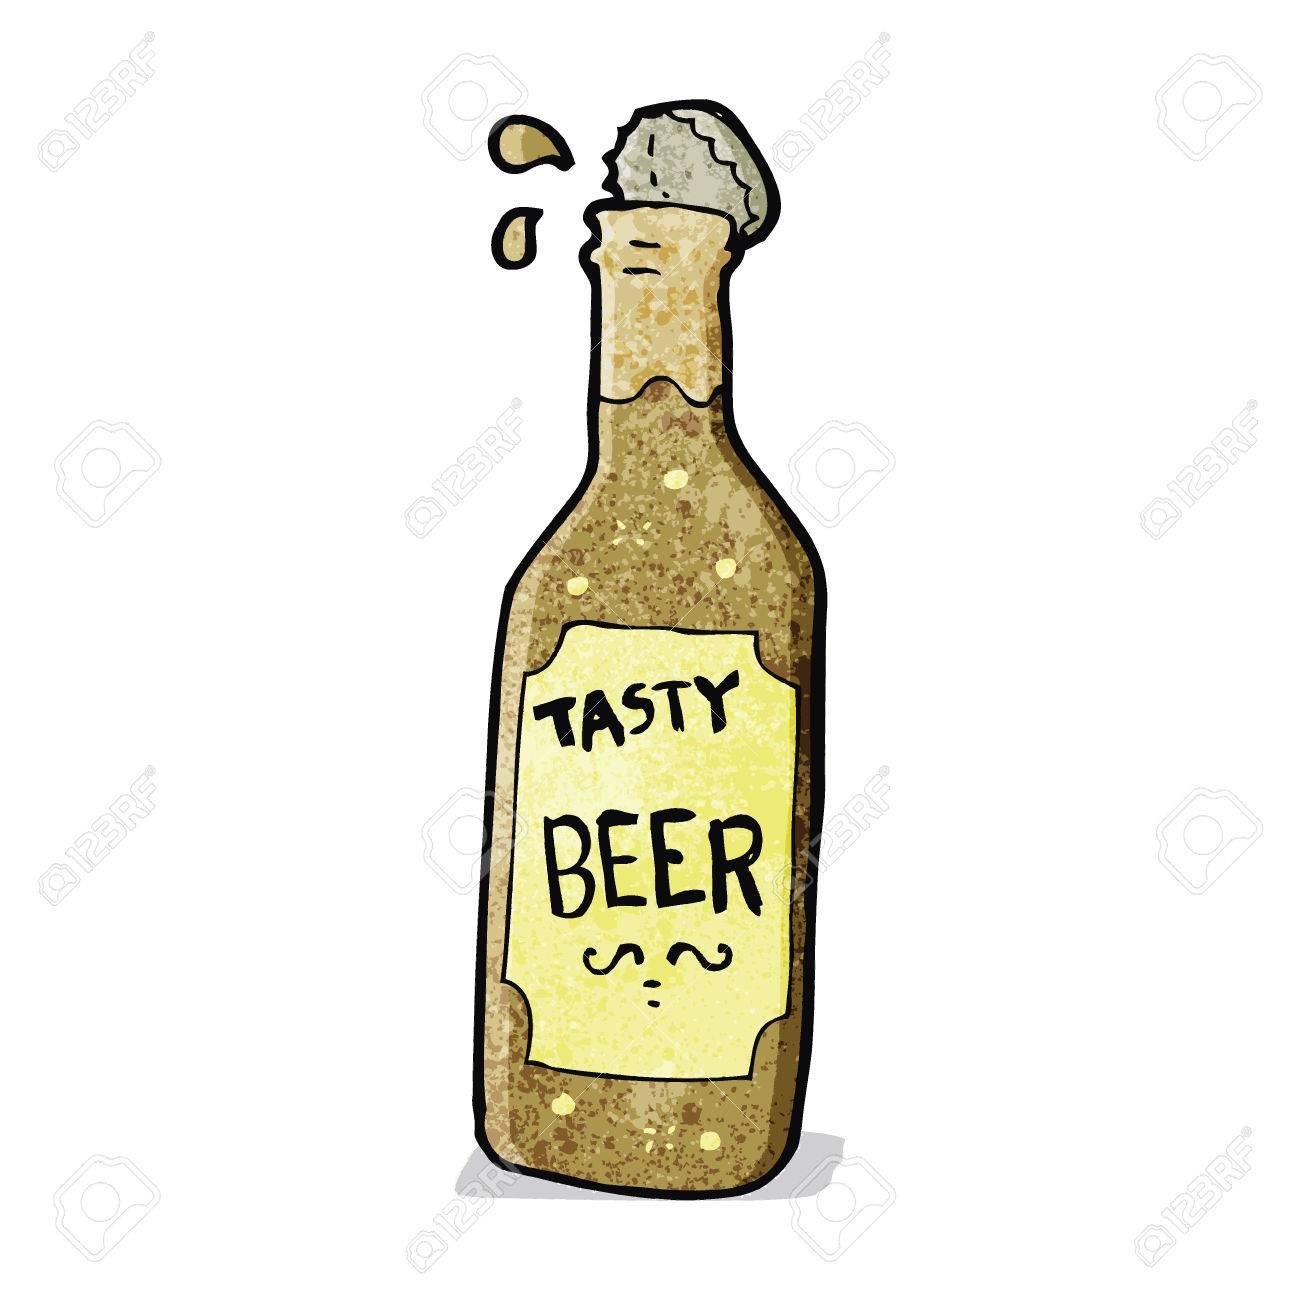 cartoon beer bottle royalty free cliparts vectors and stock rh 123rf com cartoon beer bottle photo cartoon beer bottle photo